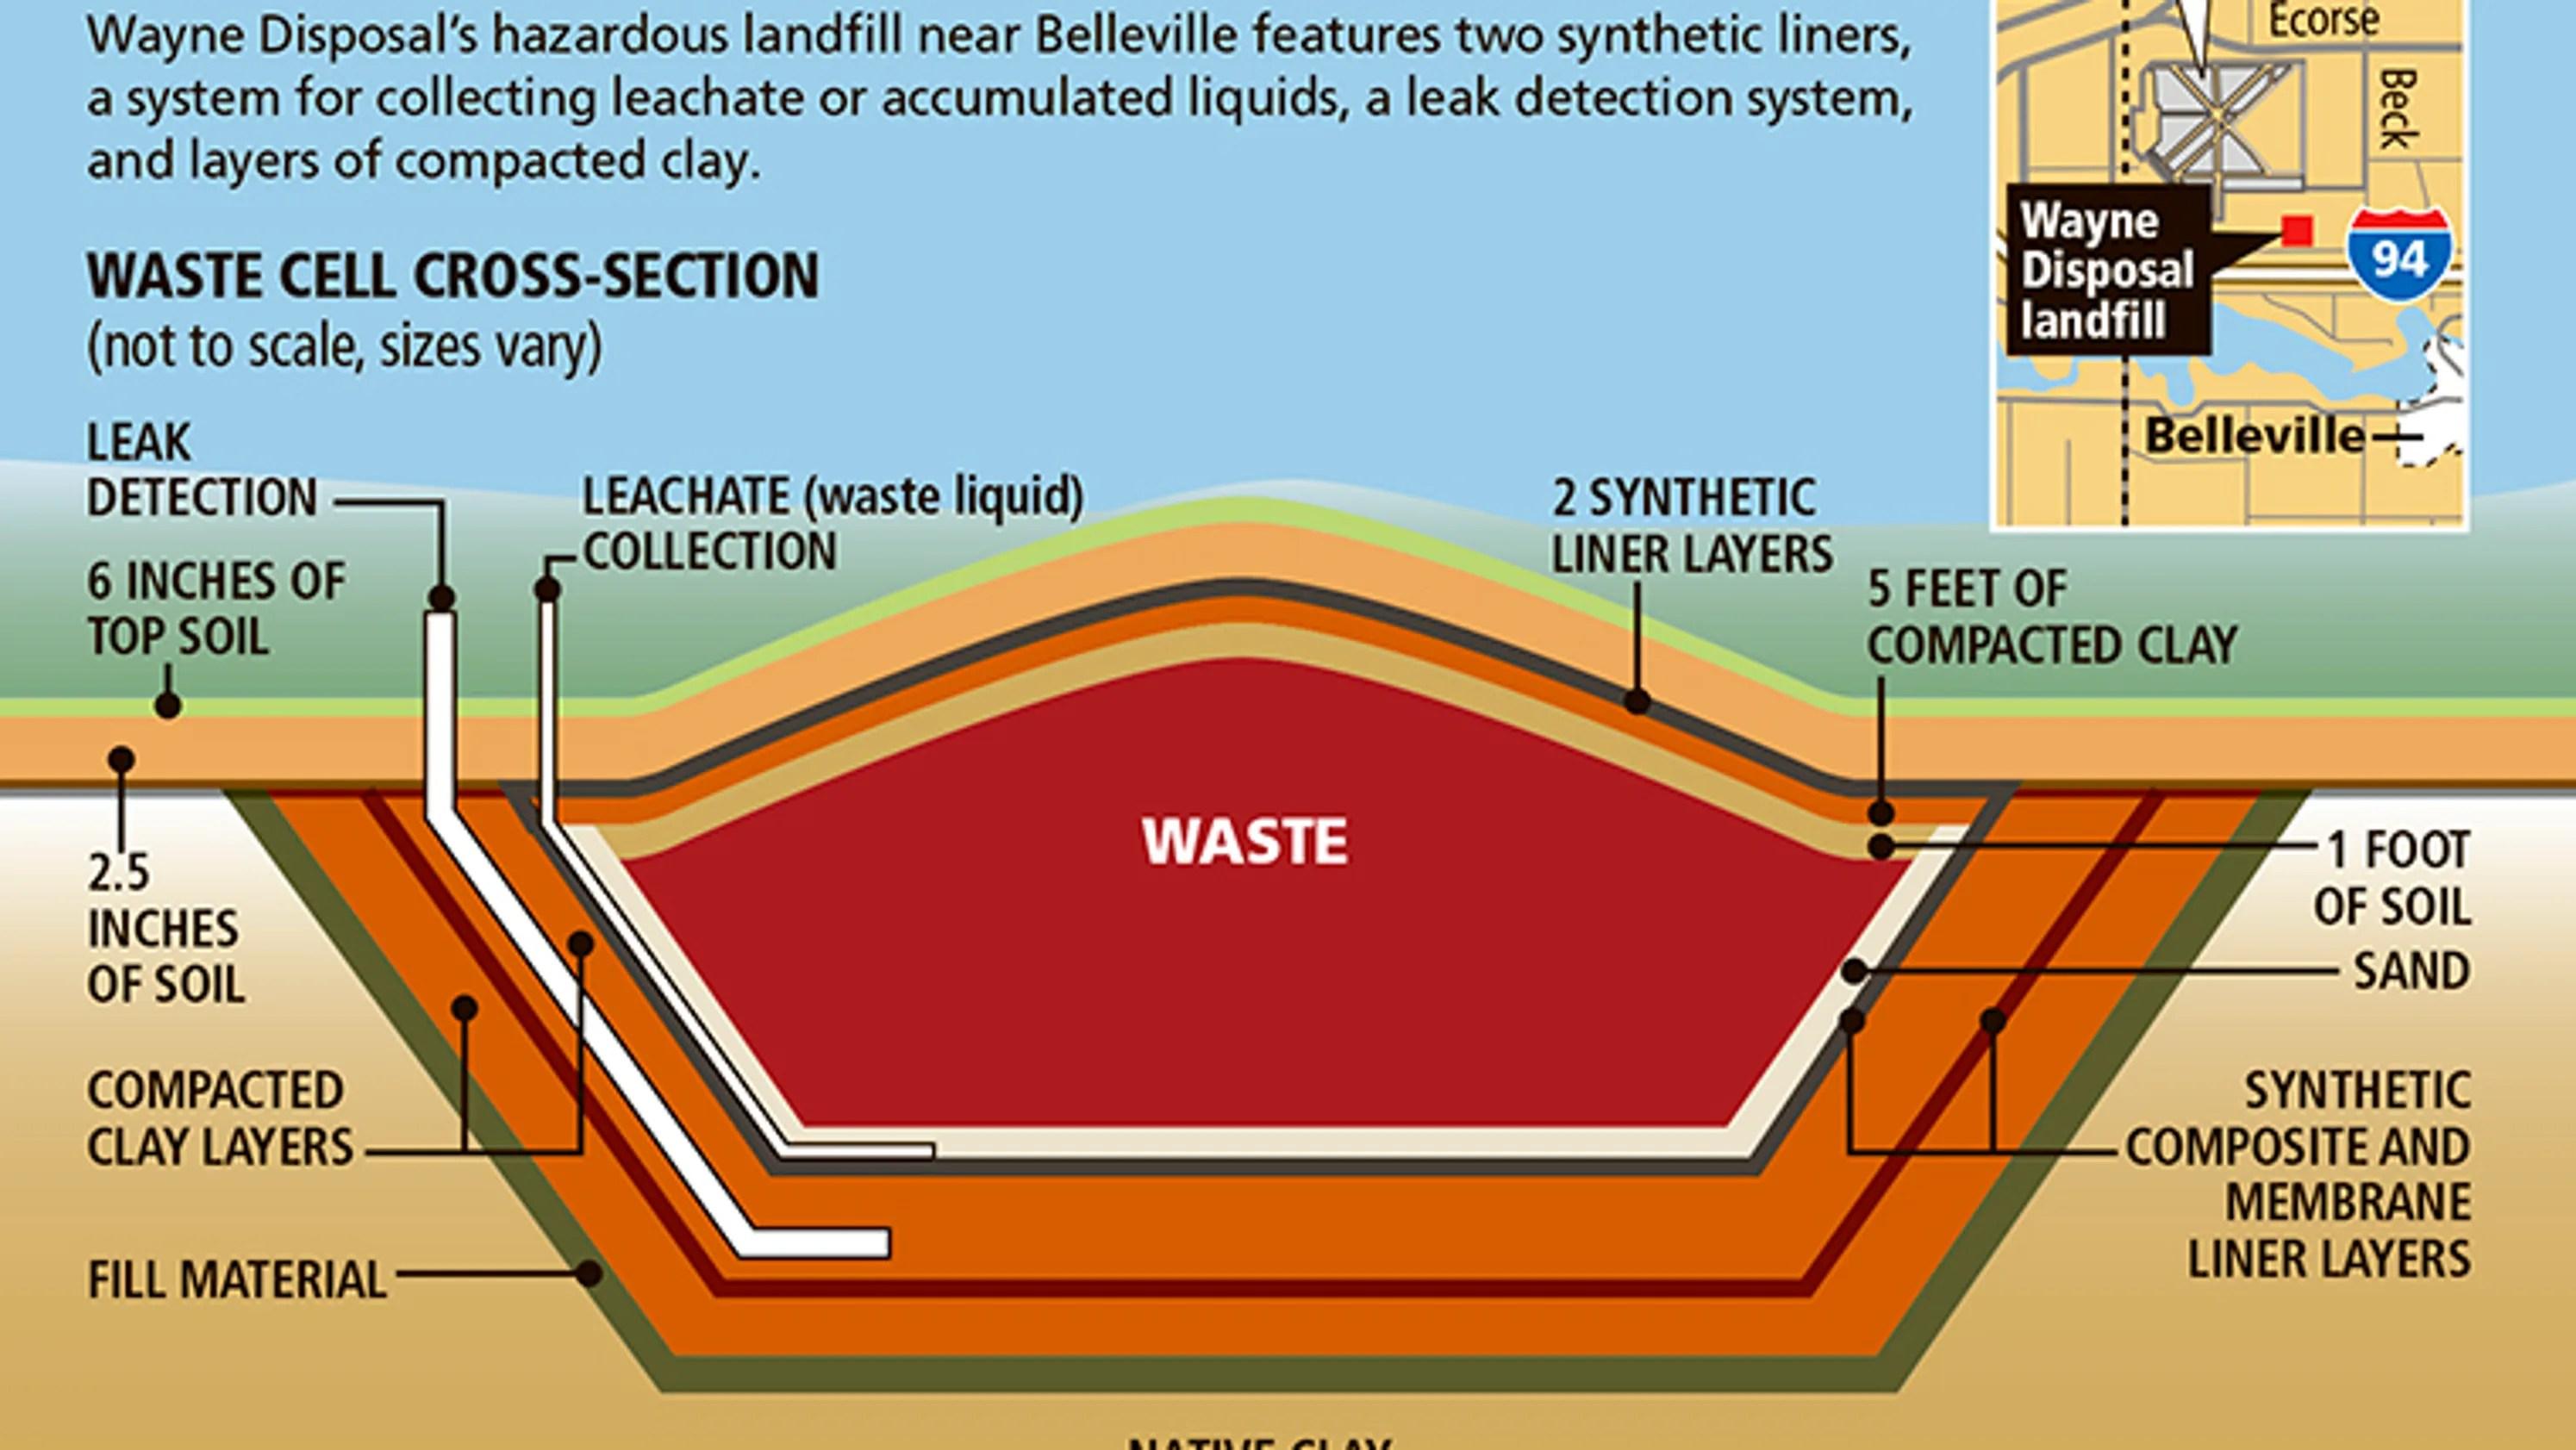 Landfill Taking Radioactive Waste Has History Of